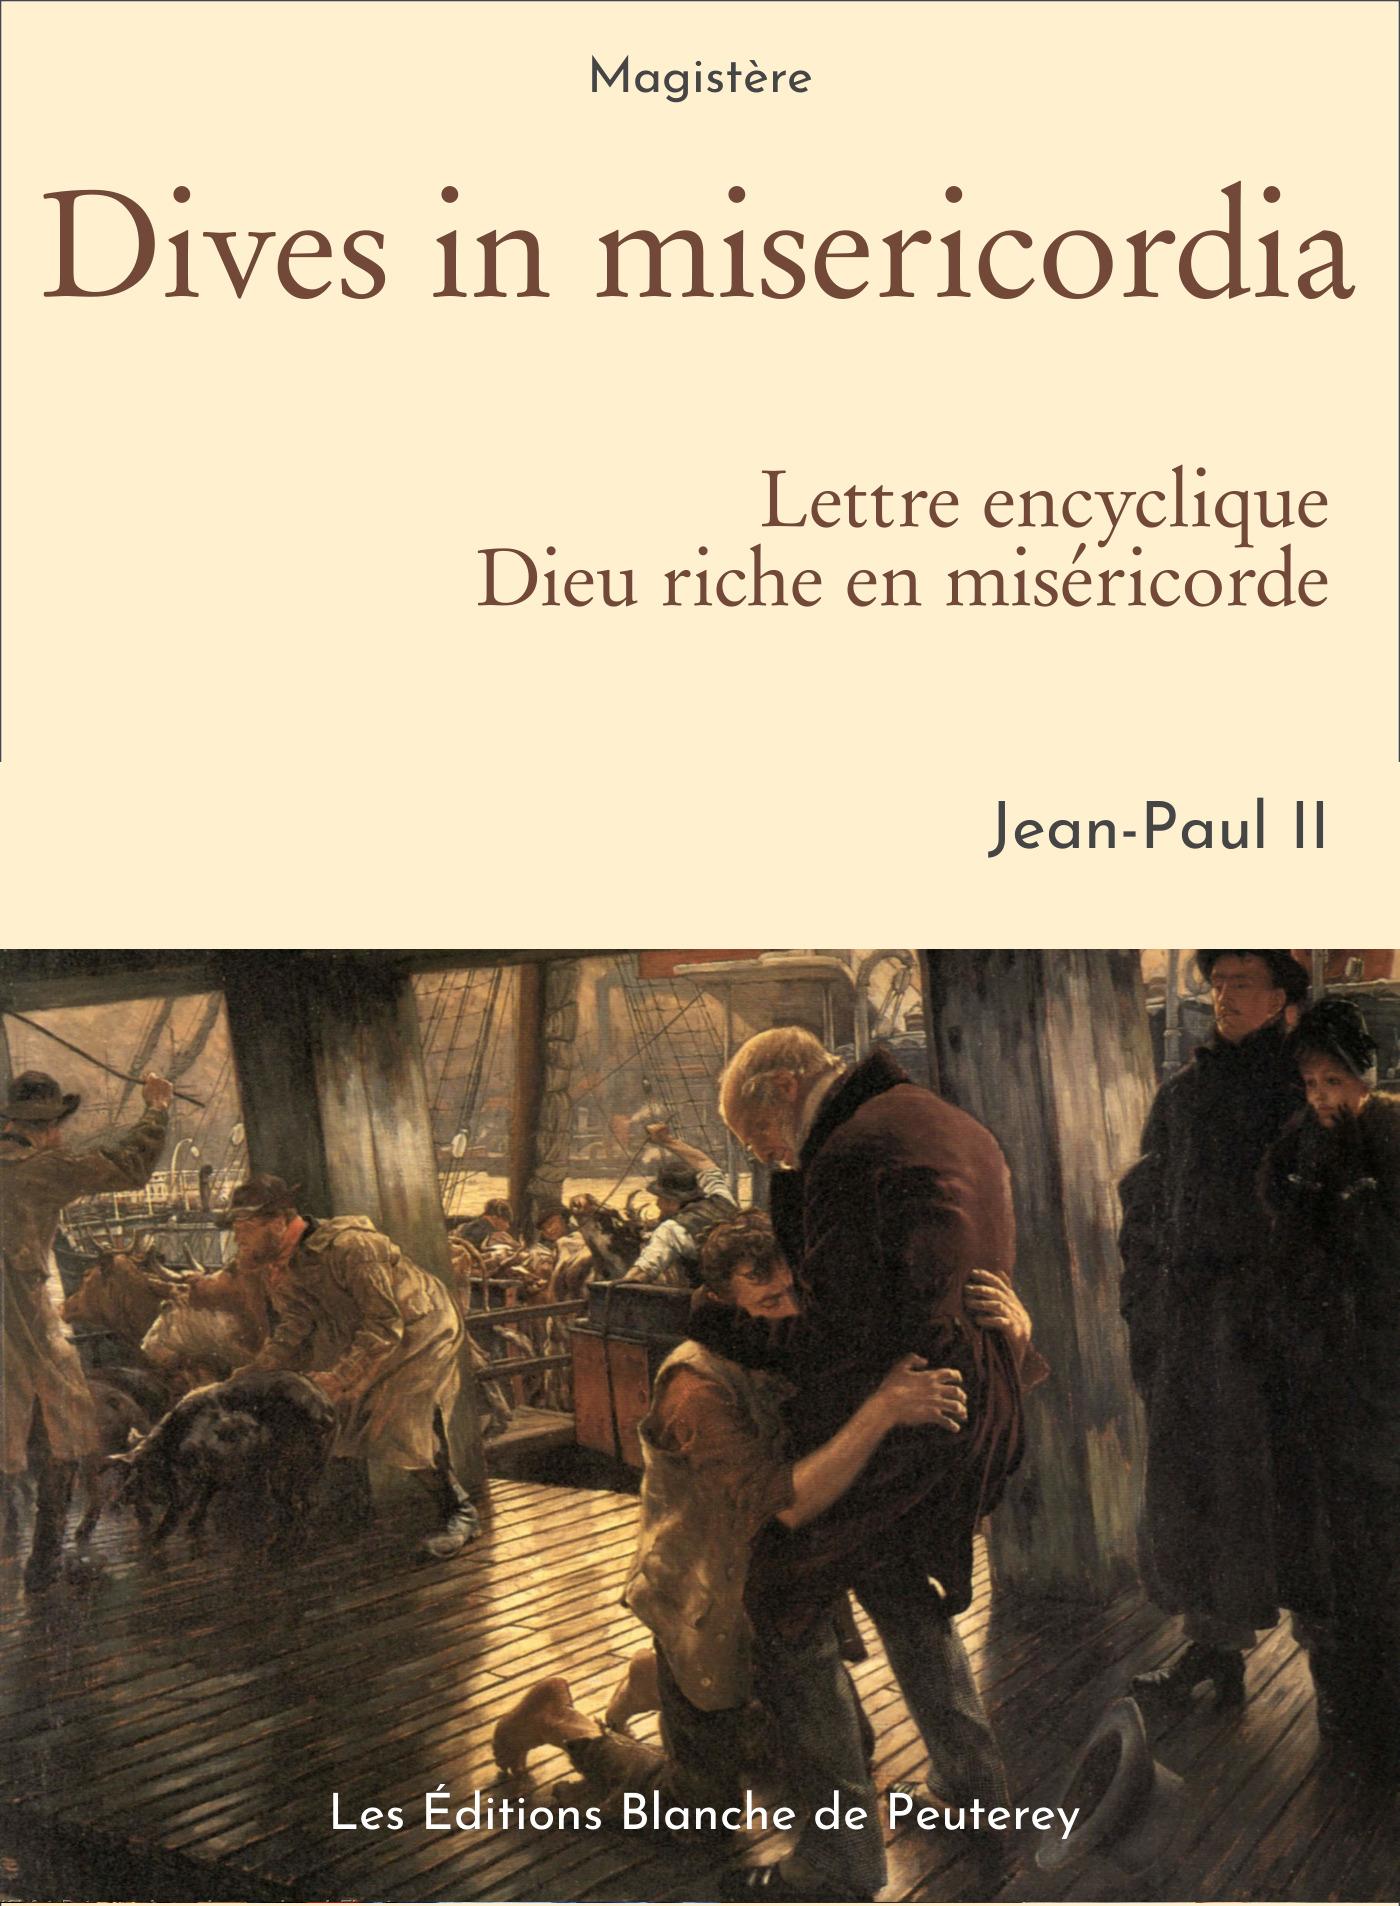 Dives in misericordia, LA MISÉRICORDE DIVINE